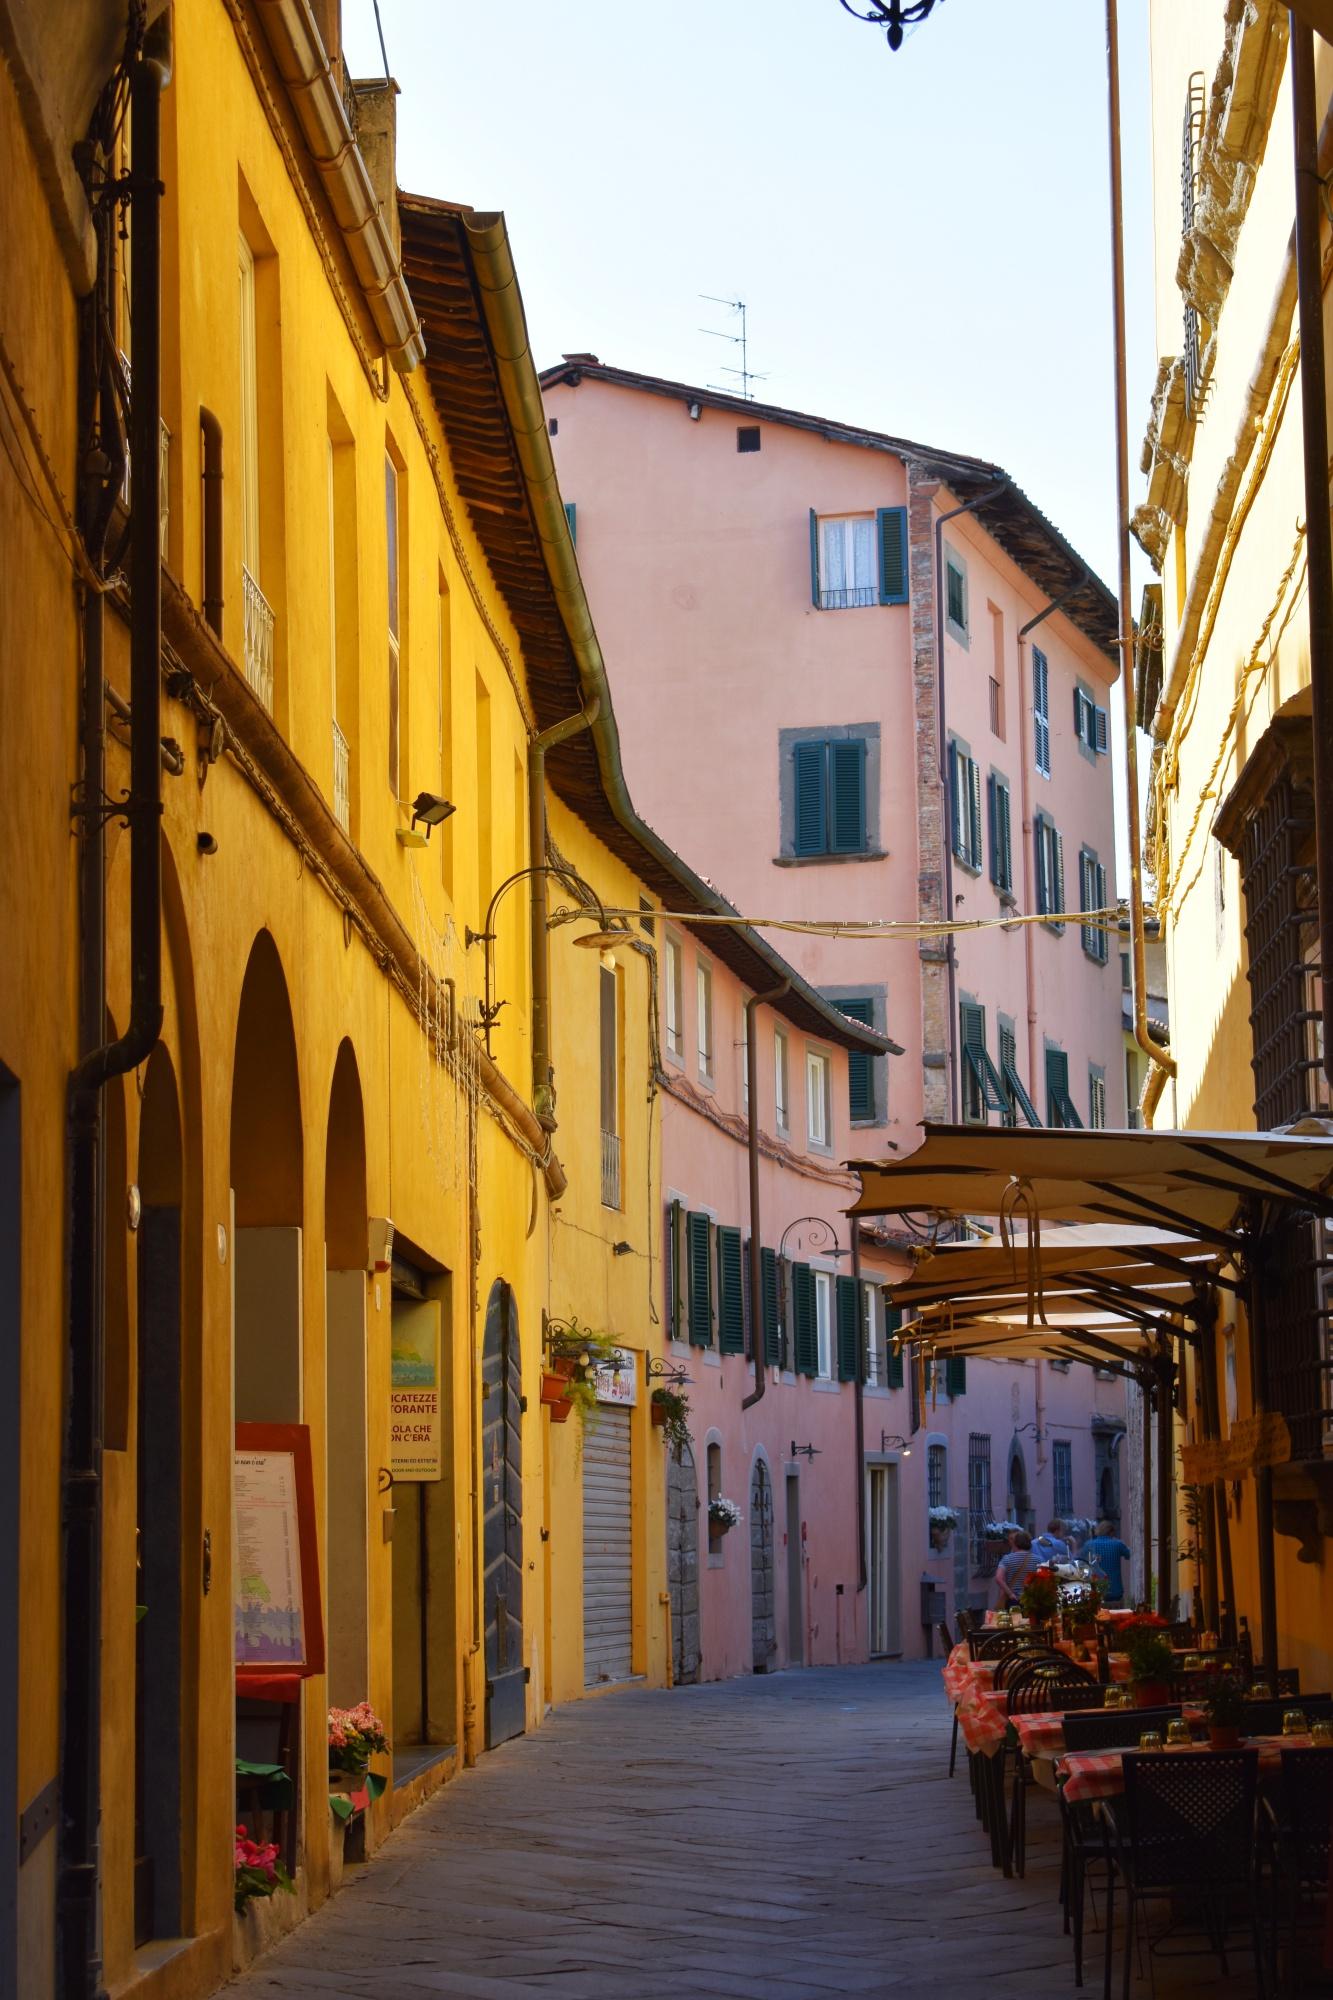 Toskana, Reisen mit Kind, Familie Urlaub, Italien